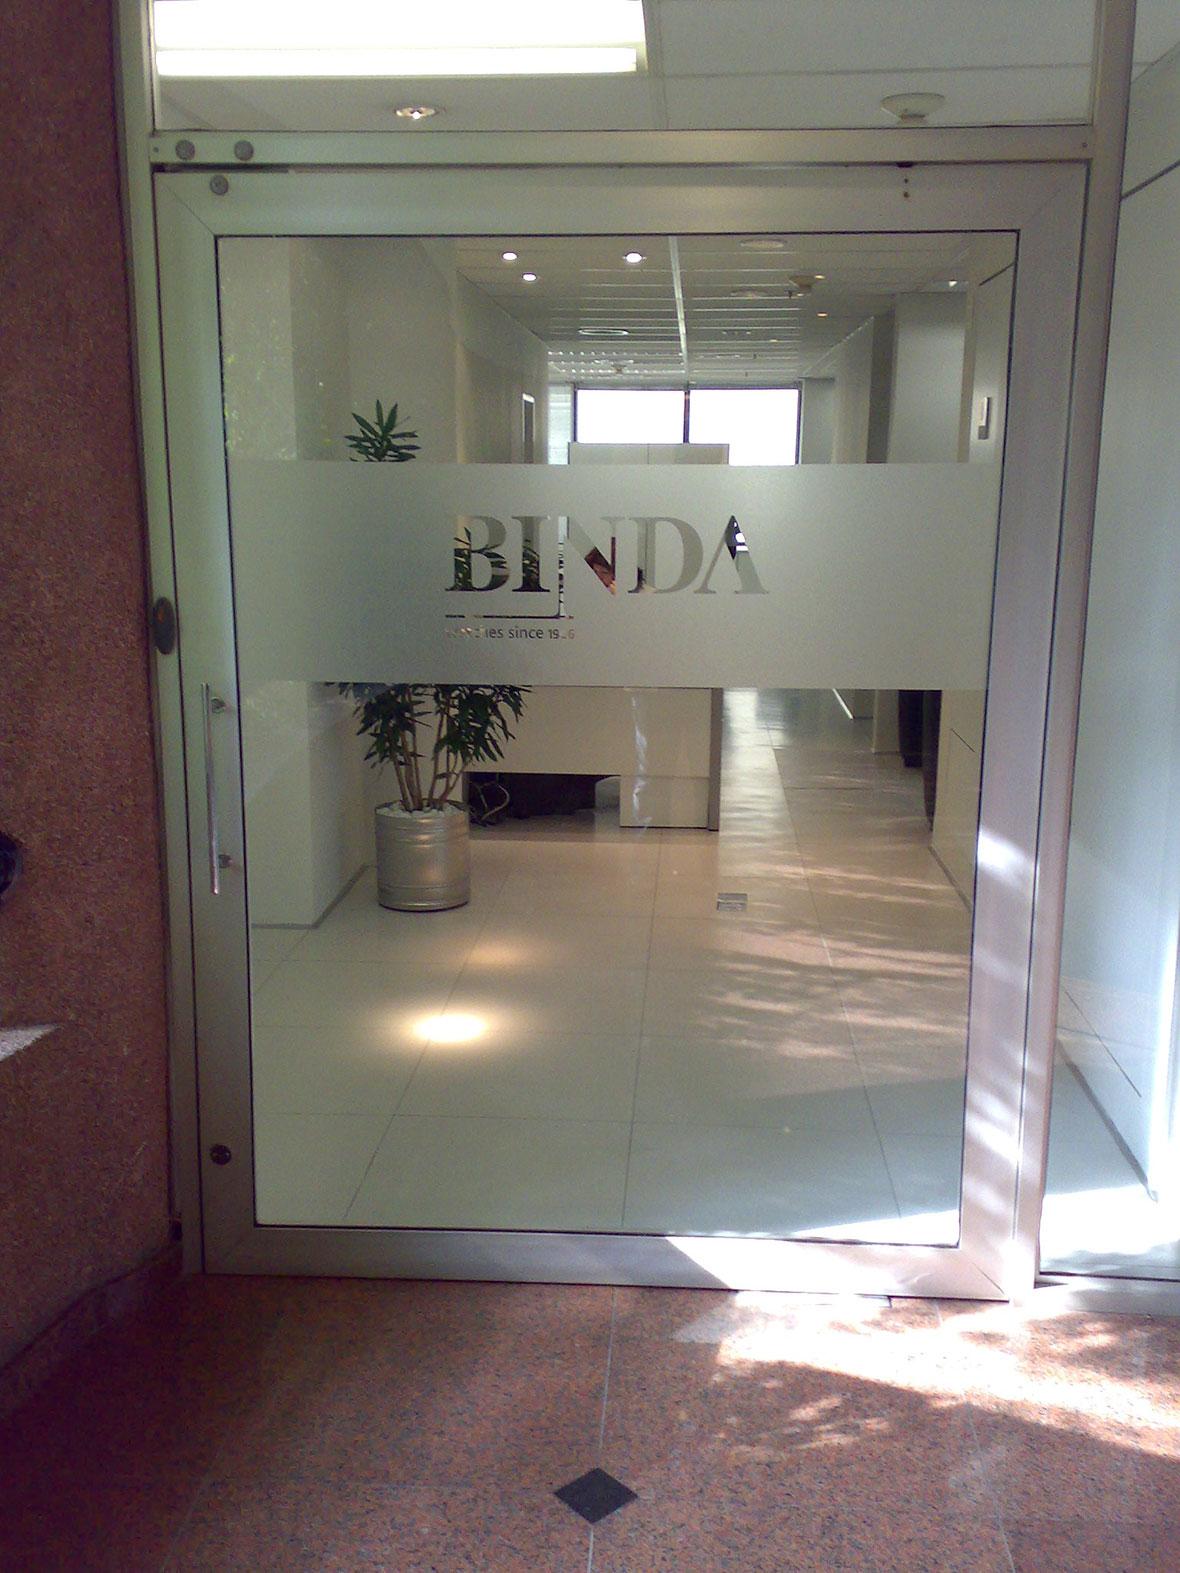 Binda